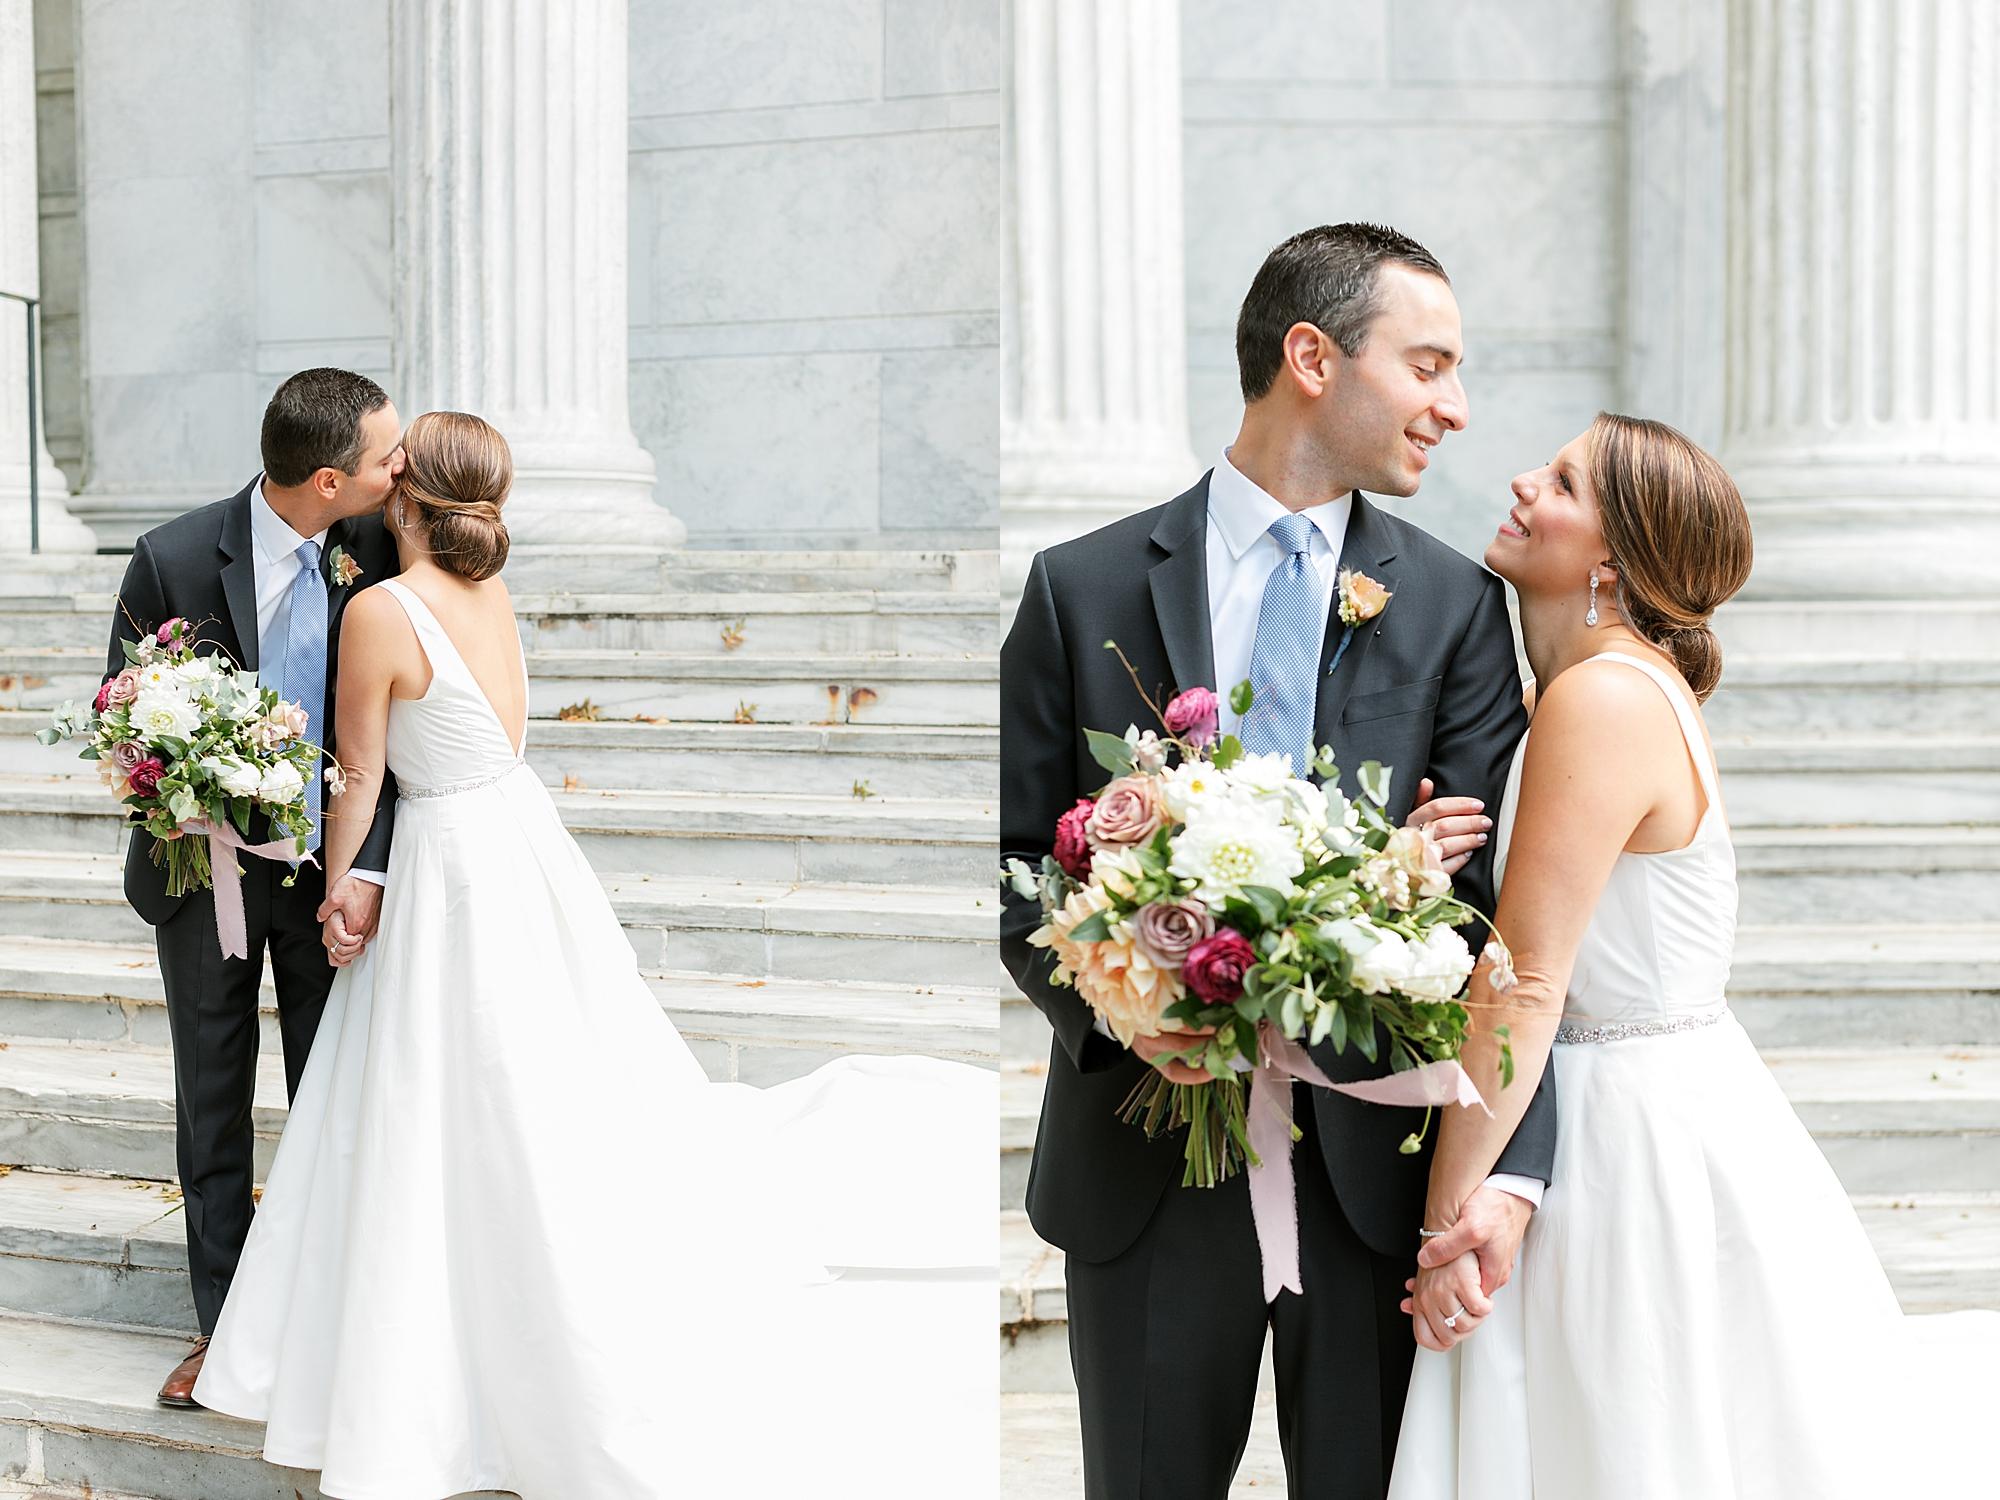 Princeton New Jersey Film Wedding Photographer Princeton University Wedding Photography by Magdalena Studios NJ Wedding Photographer24